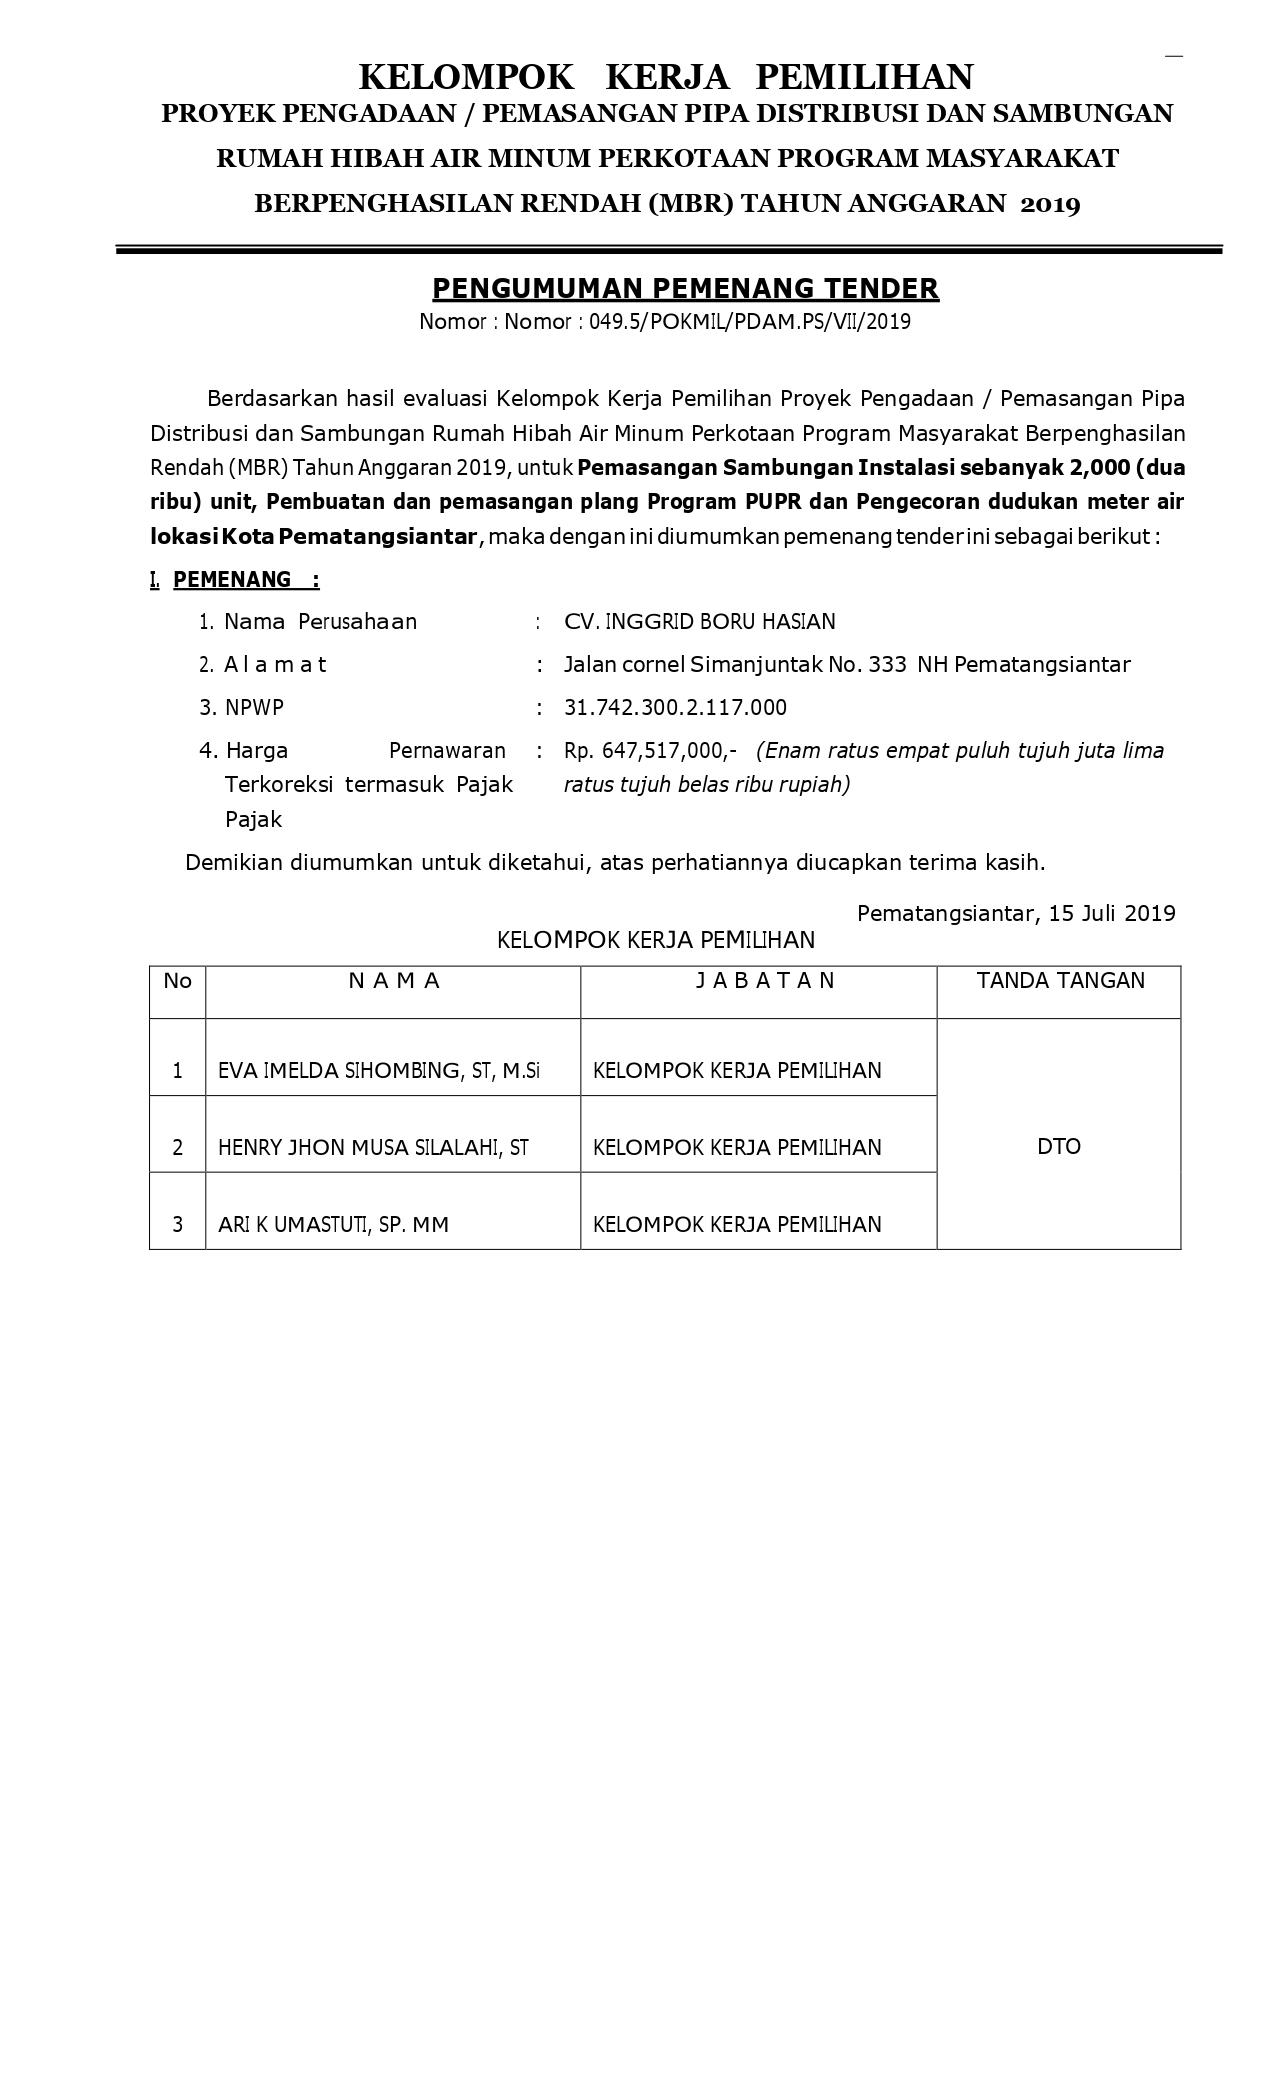 PENGUMUMAN PEMENANG TENDER PROGRAM HIBAH AIR MINUM (MBR) PDAM TIRTAULI TA.2019  PEMASANGAN SAMBUNGAN INSTALASI